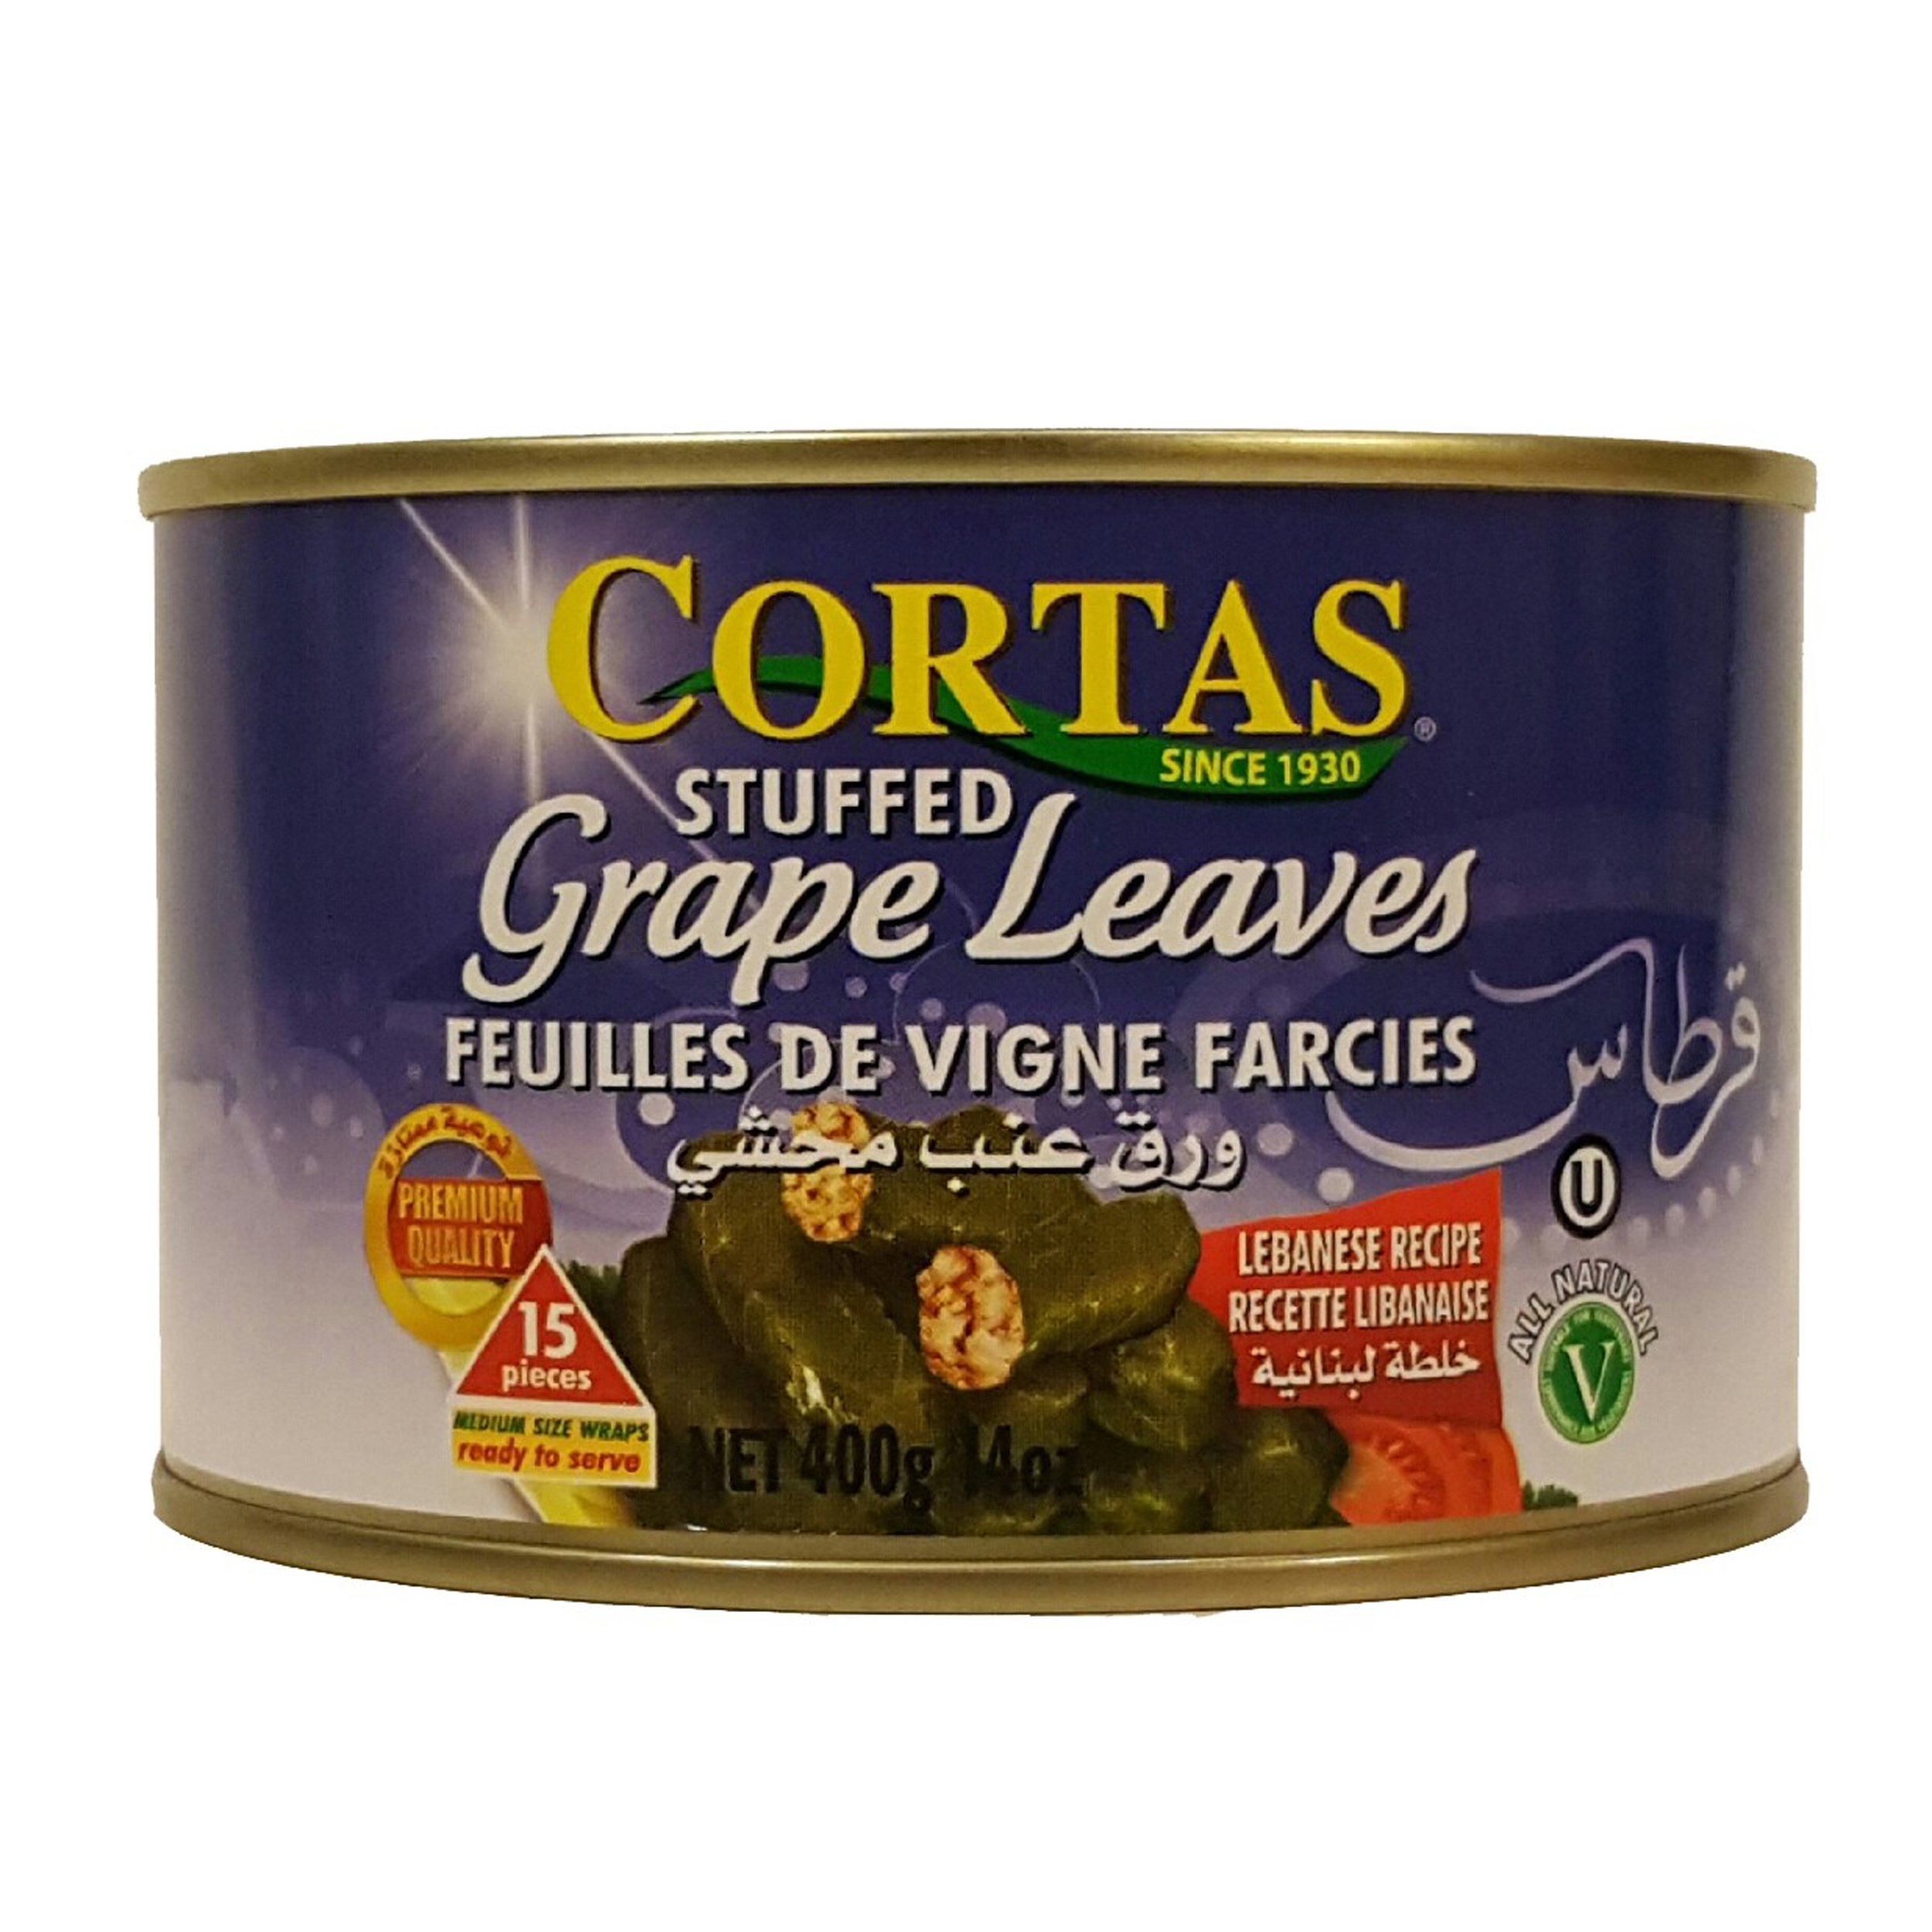 Cortas Stuffed Grape Leaves 14oz (pack of 3)